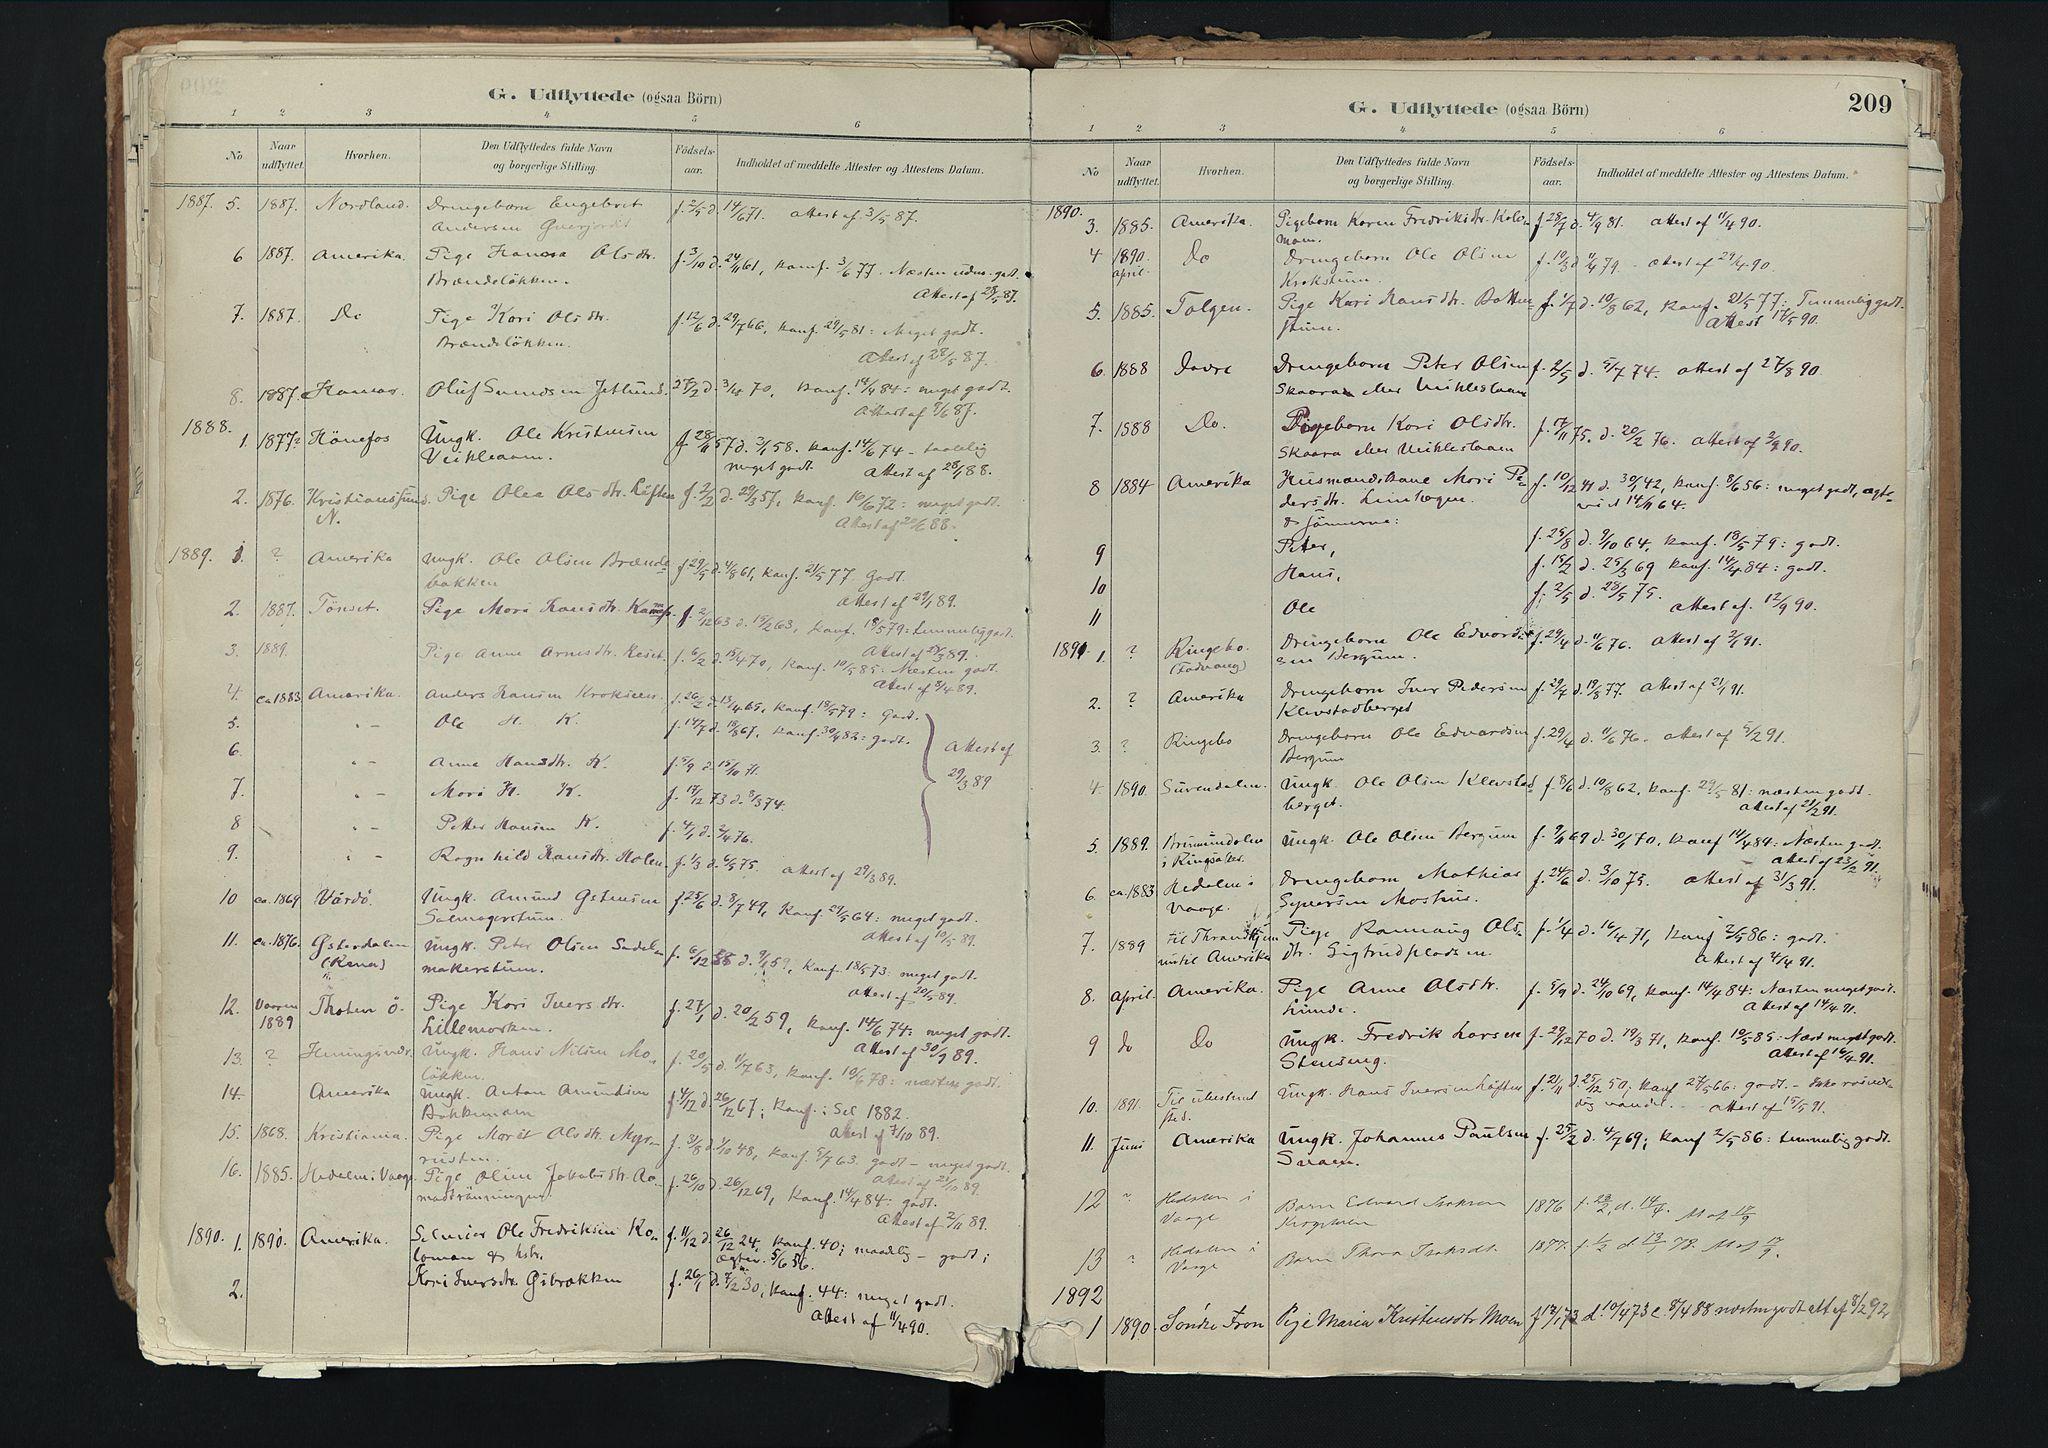 SAH, Nord-Fron prestekontor, Ministerialbok nr. 3, 1884-1914, s. 209